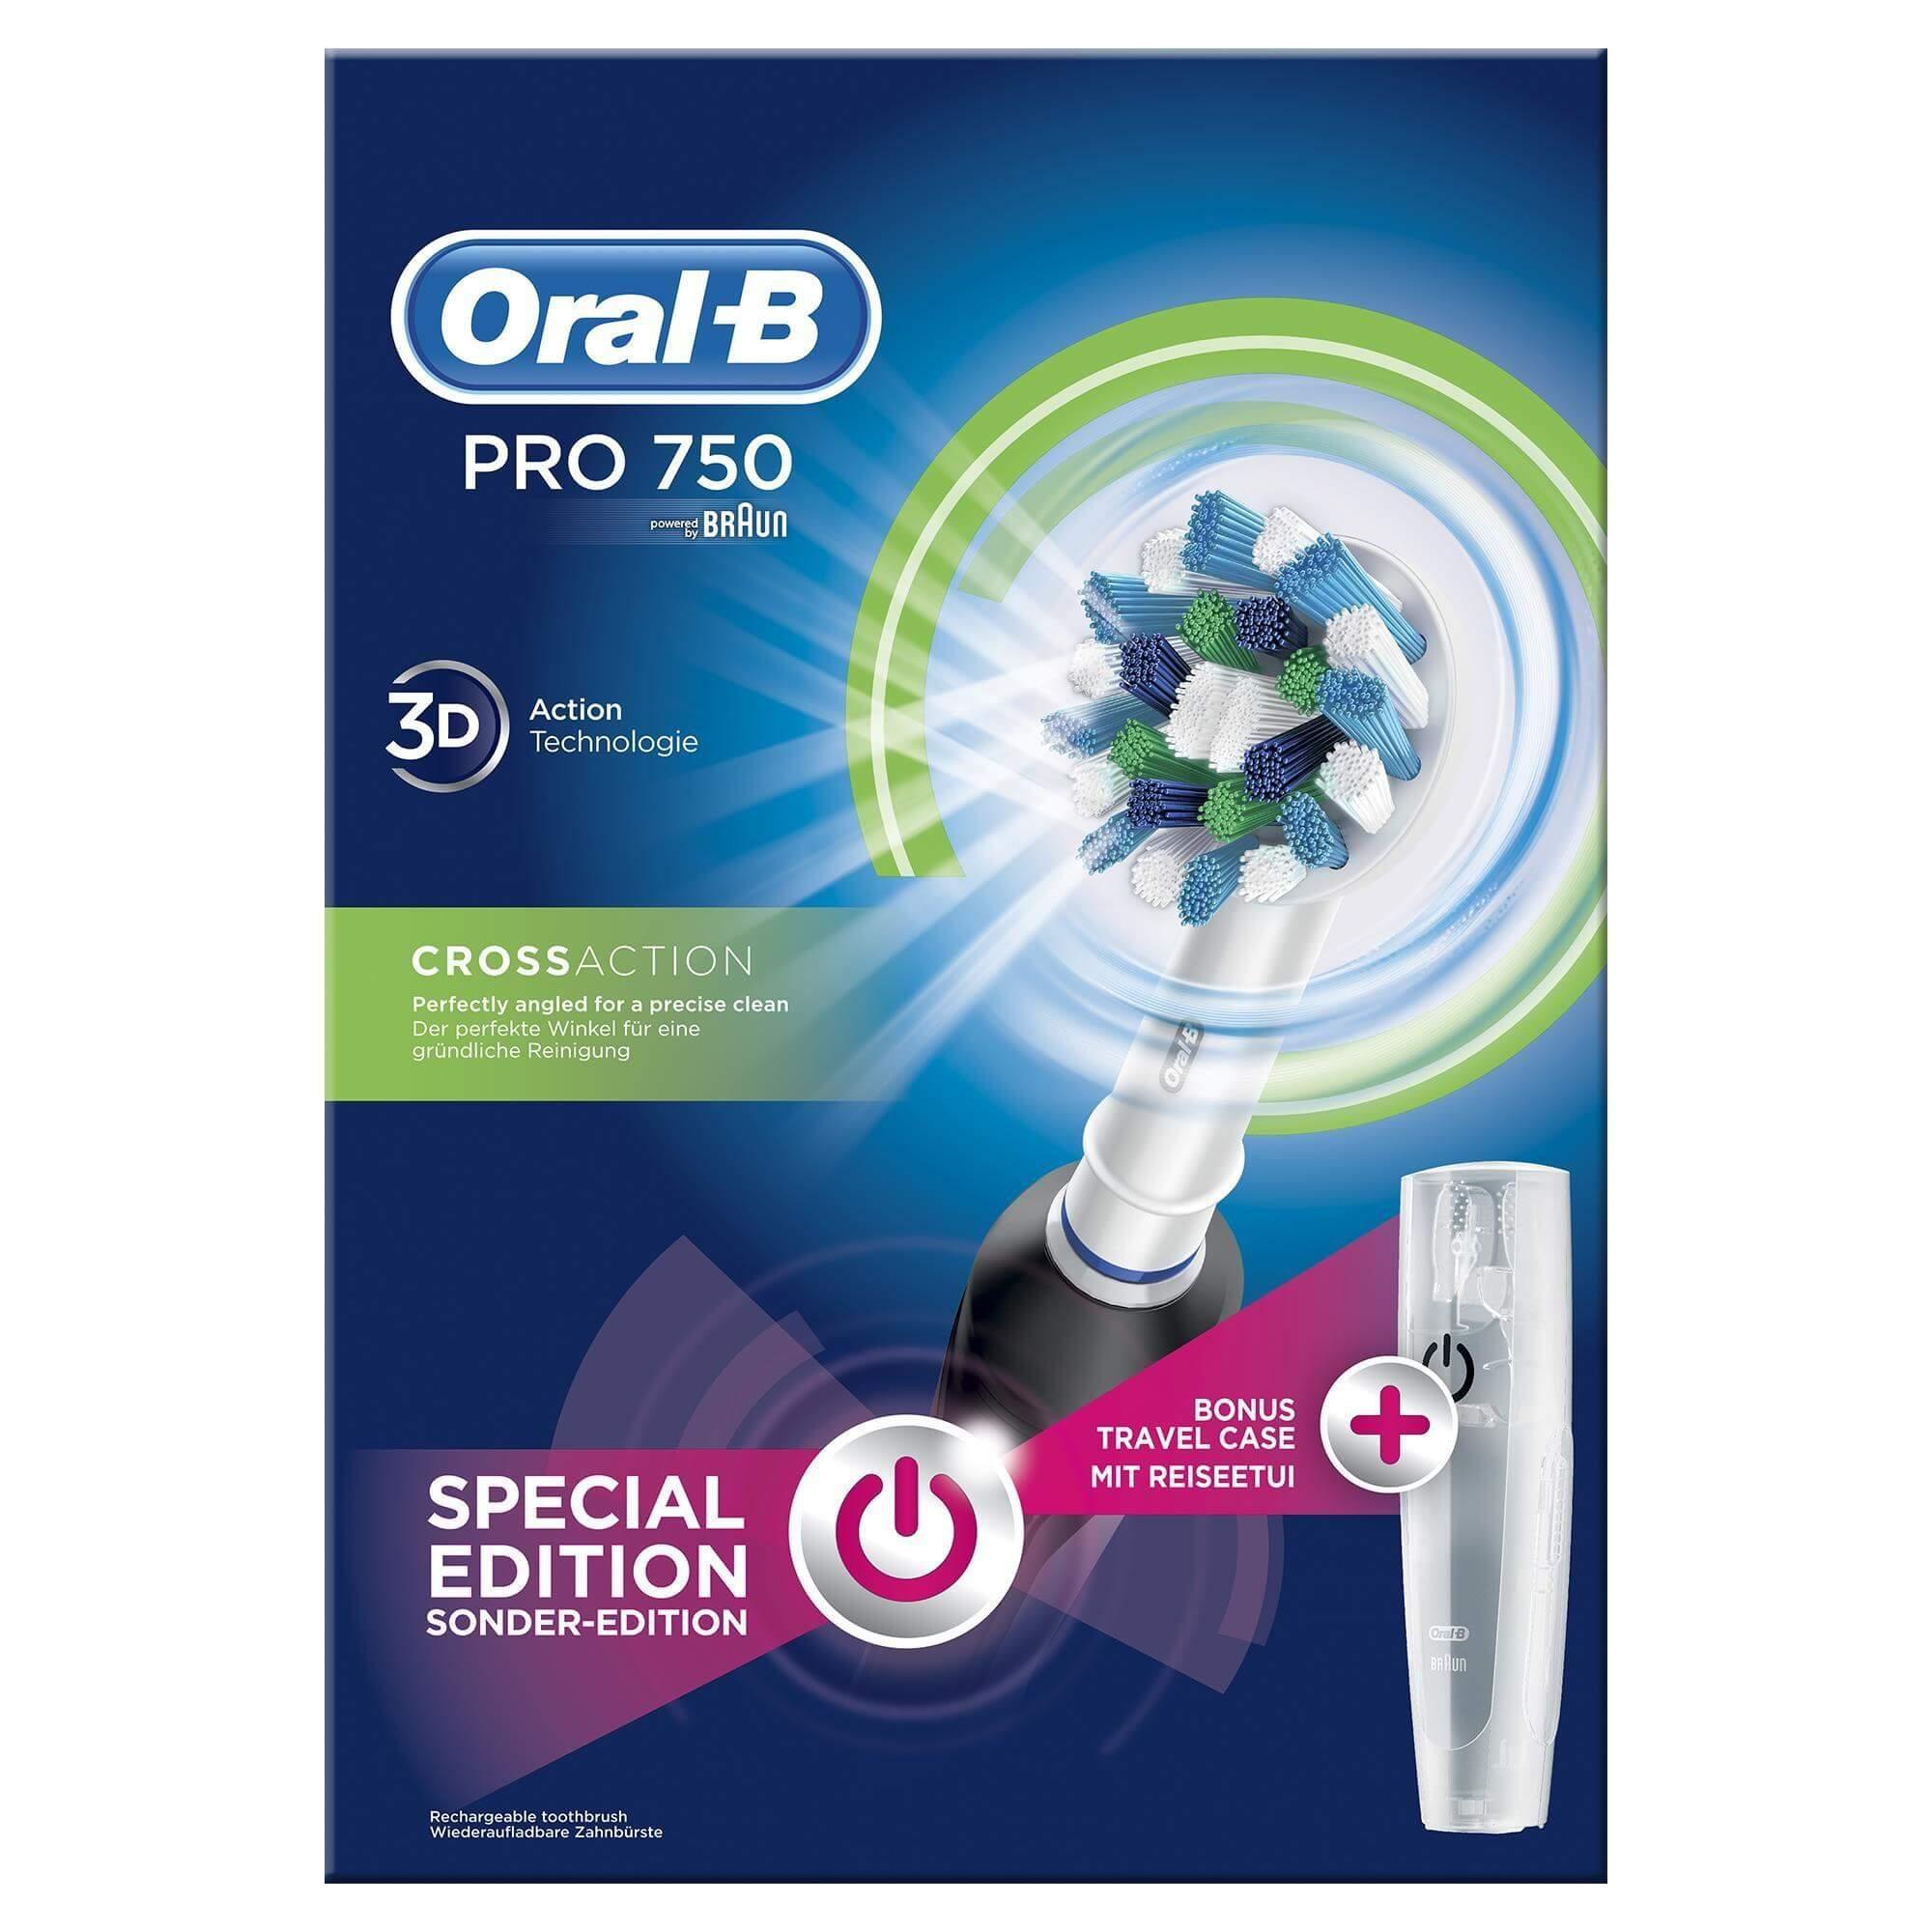 Oral B Pro 750 Cross Action 3D Black Special Edition Ηλεκτρική Οδοντόβουρτσα για Βαθύ Καθαρισμό σε Μαύρο Χρώμα